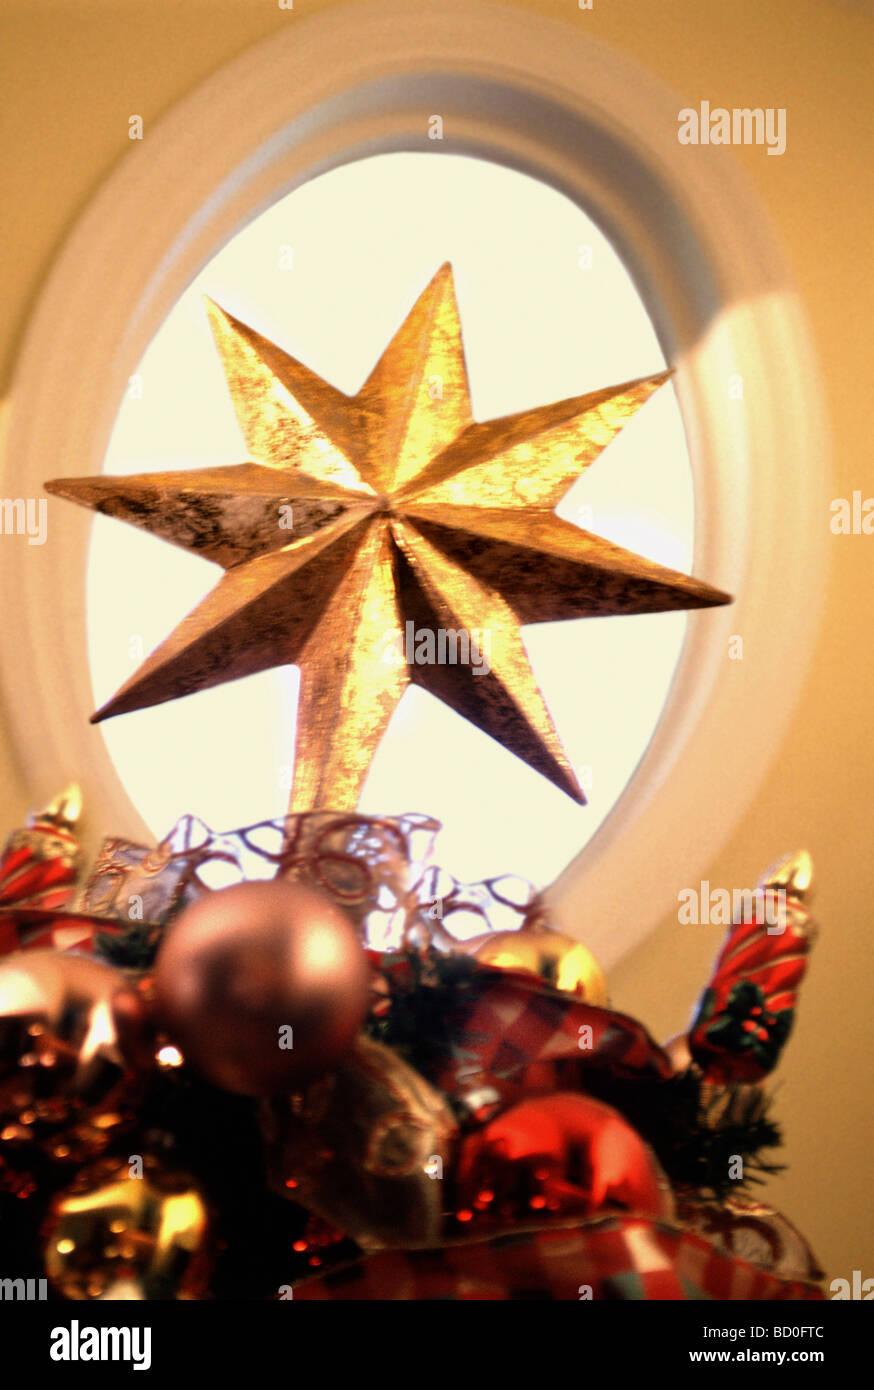 Gold Christmas ornament - Stock Image